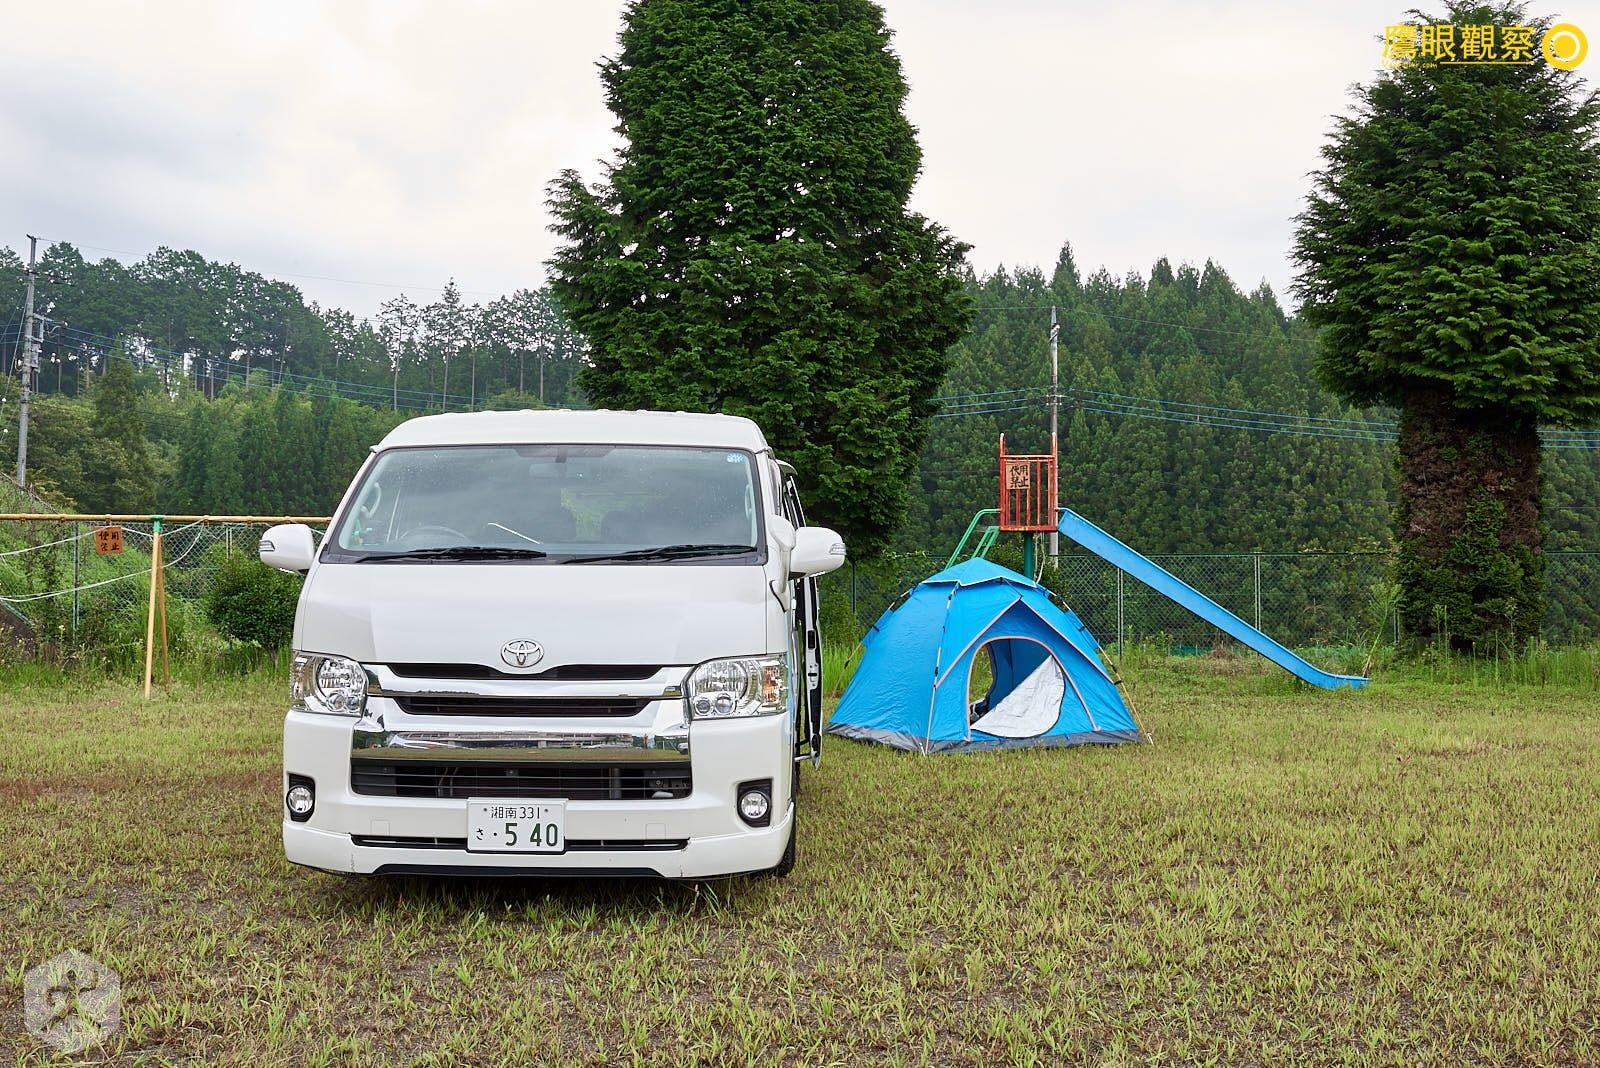 Japan Travel RV Camper toyota hiace 20190818053248 日本廢棄小學 🚗 RV 休旅車露營、森林探險之旅(櫪木縣鹿沼市立久我小學)🇯🇵⛺️